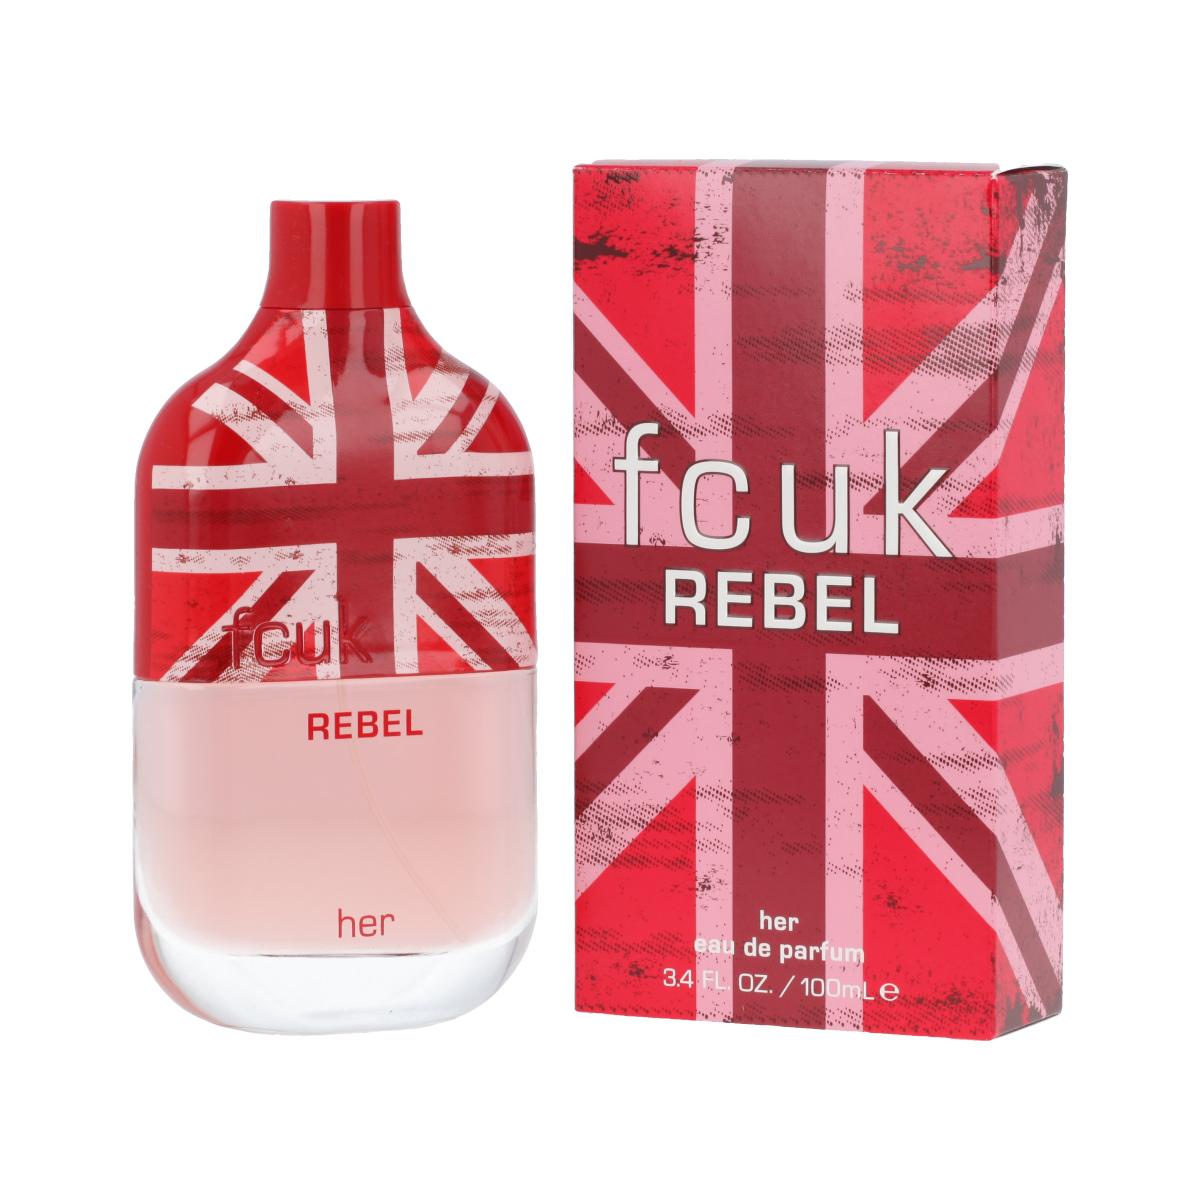 FCUK Rebel Her Eau De Parfum 100 ml (woman) 12521